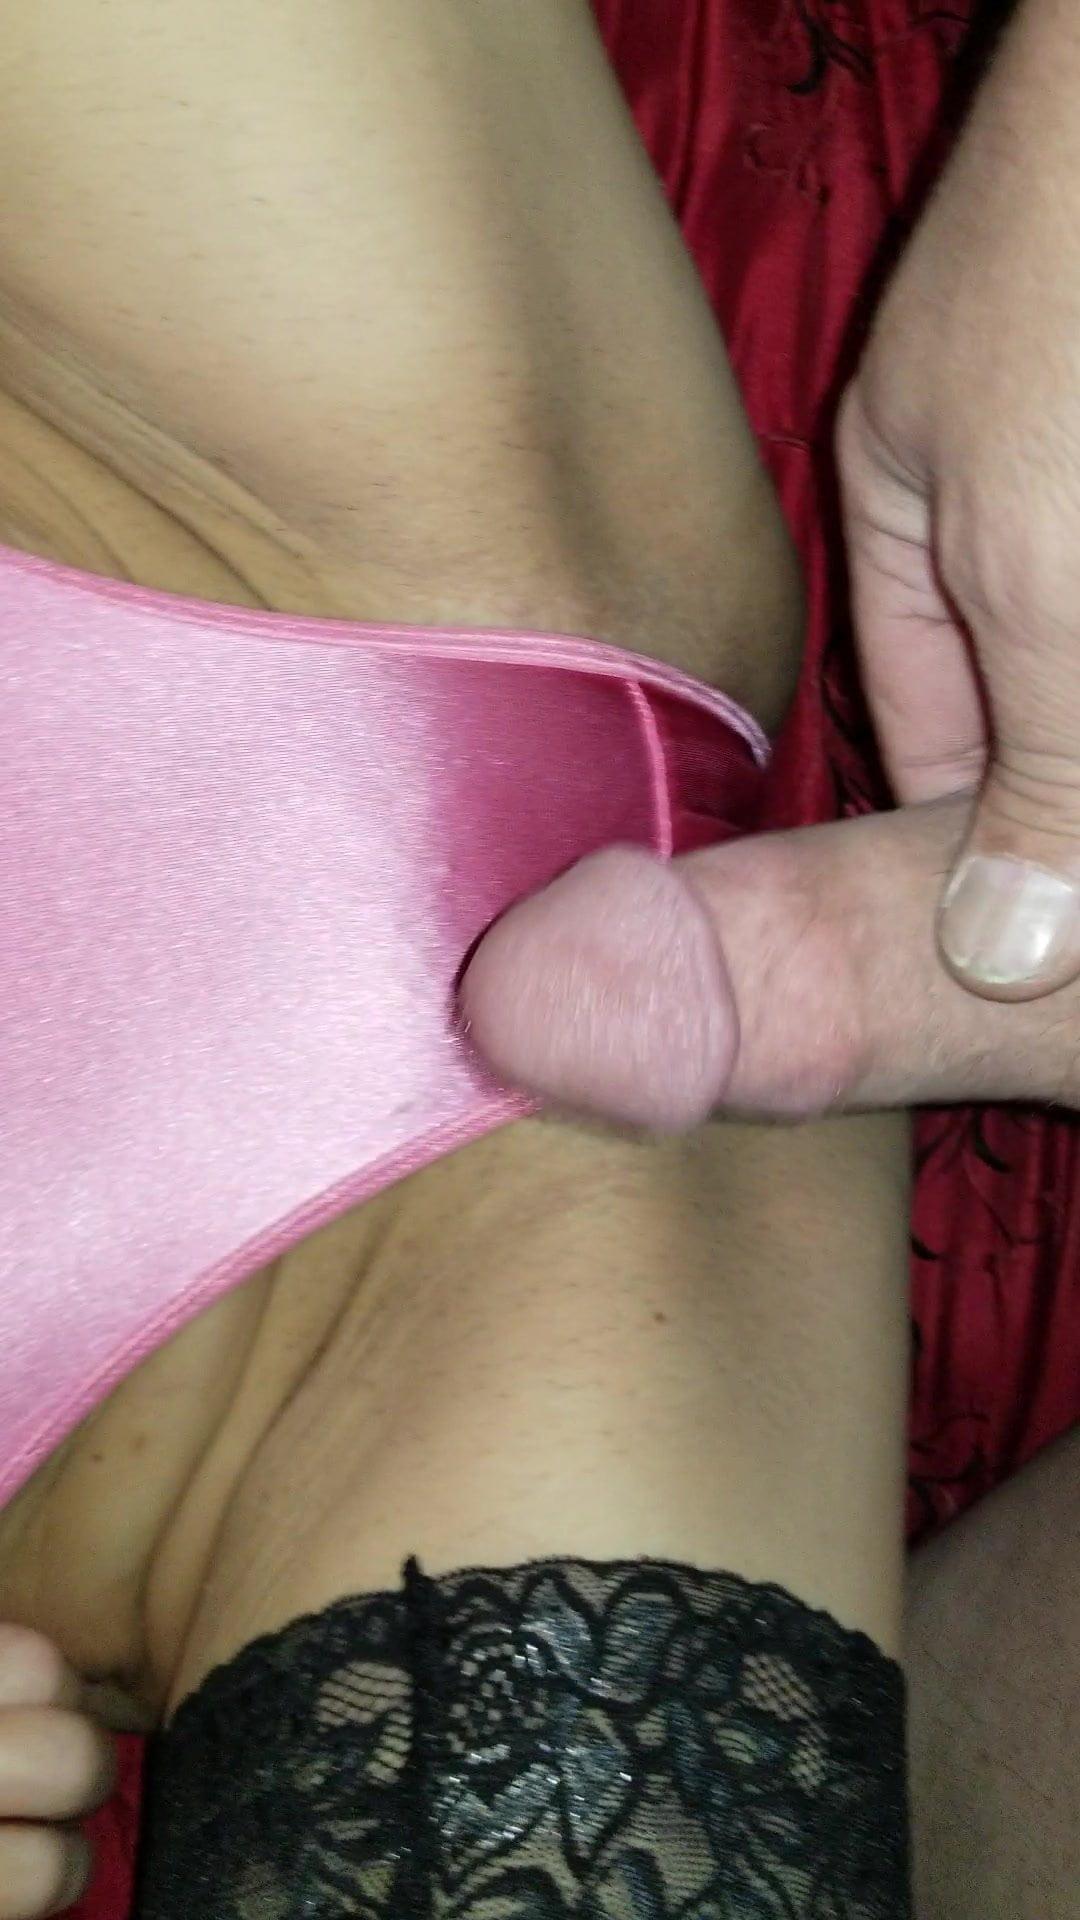 women-in-satin-panties-having-anal-sex-hq-blowjob-movie